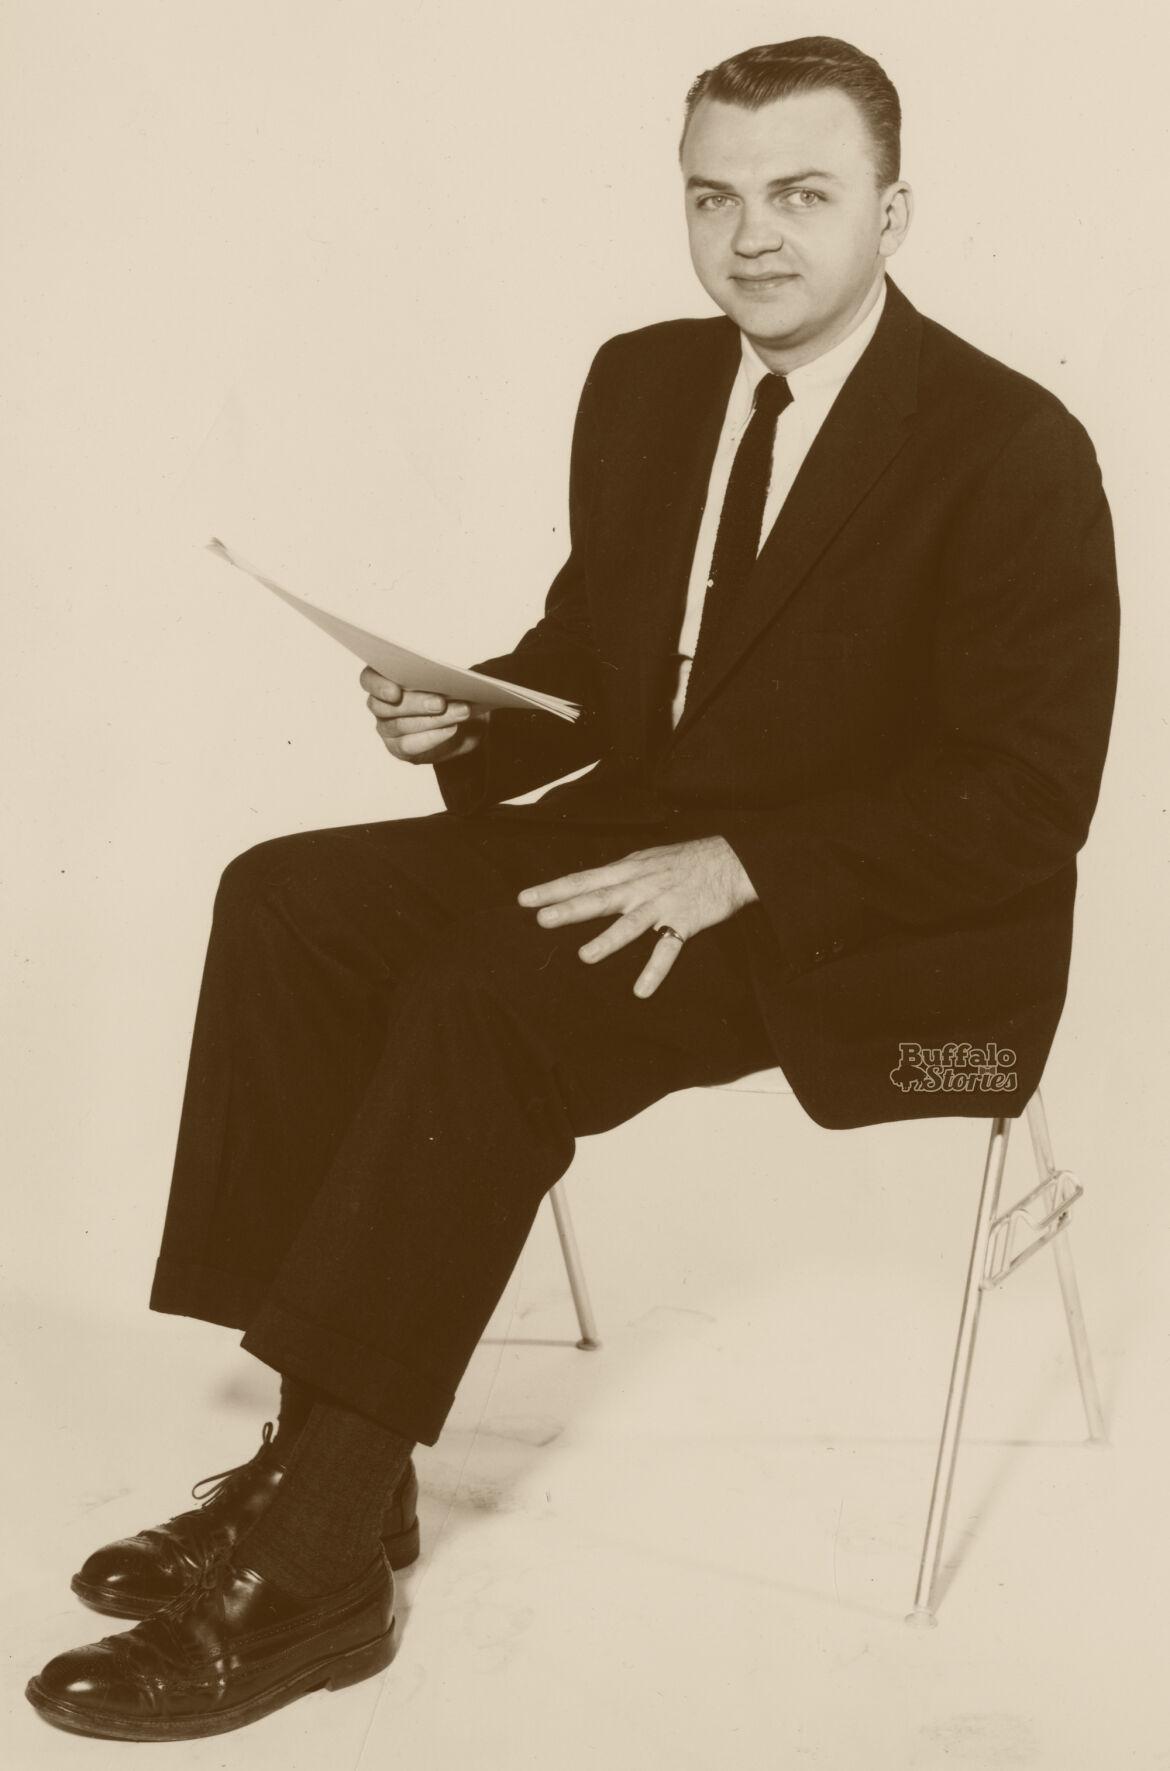 John Otto Sits